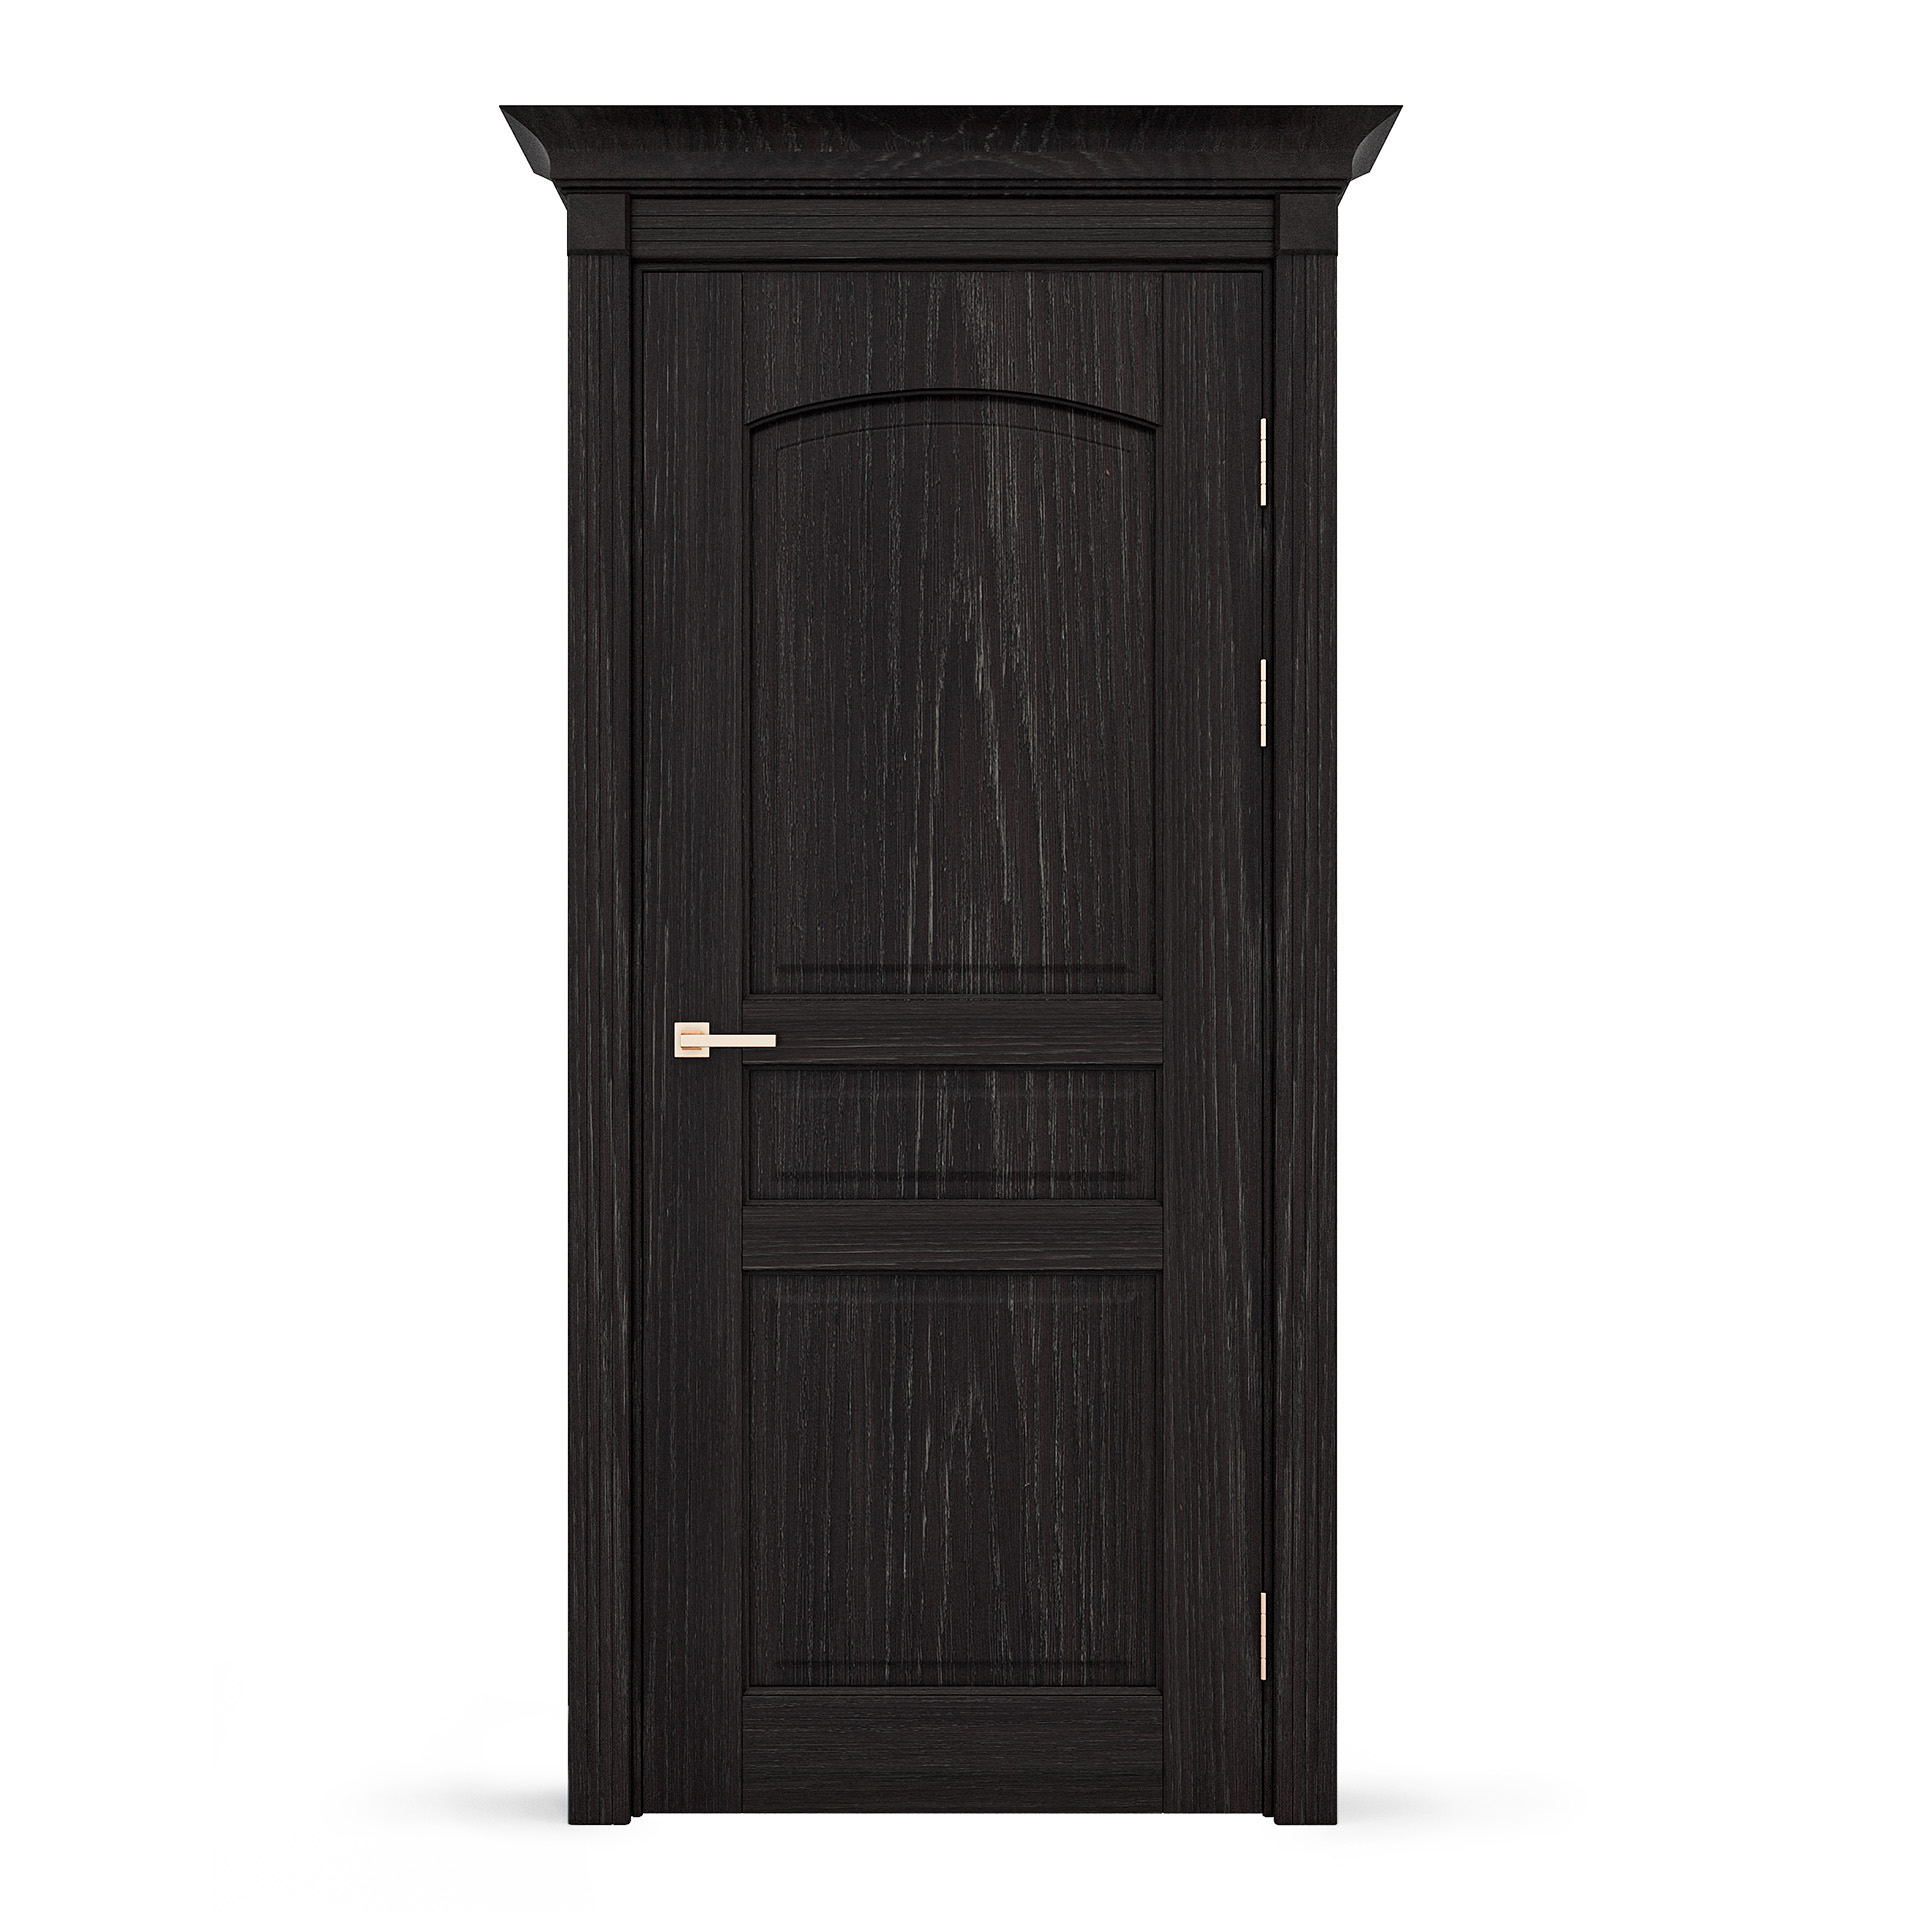 Второй вариант двери Англия